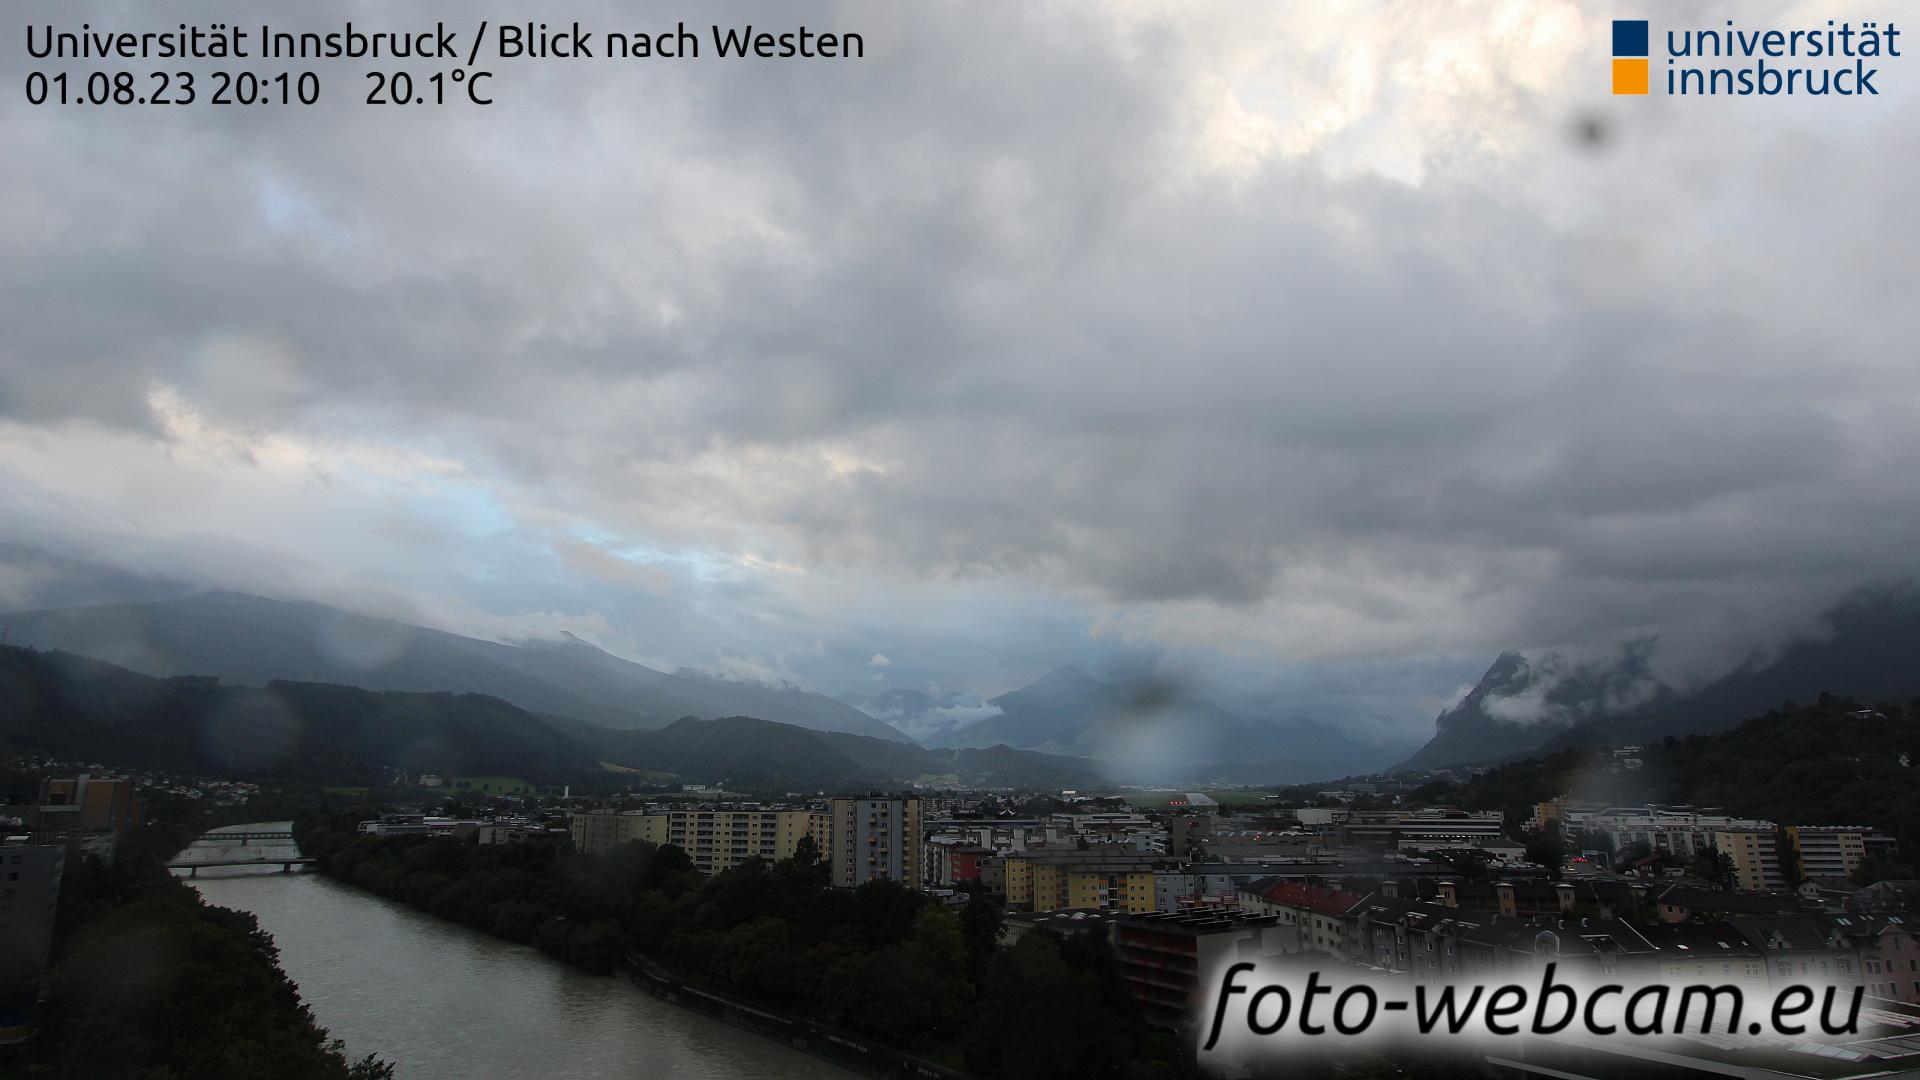 Innsbruck Sun. 20:25